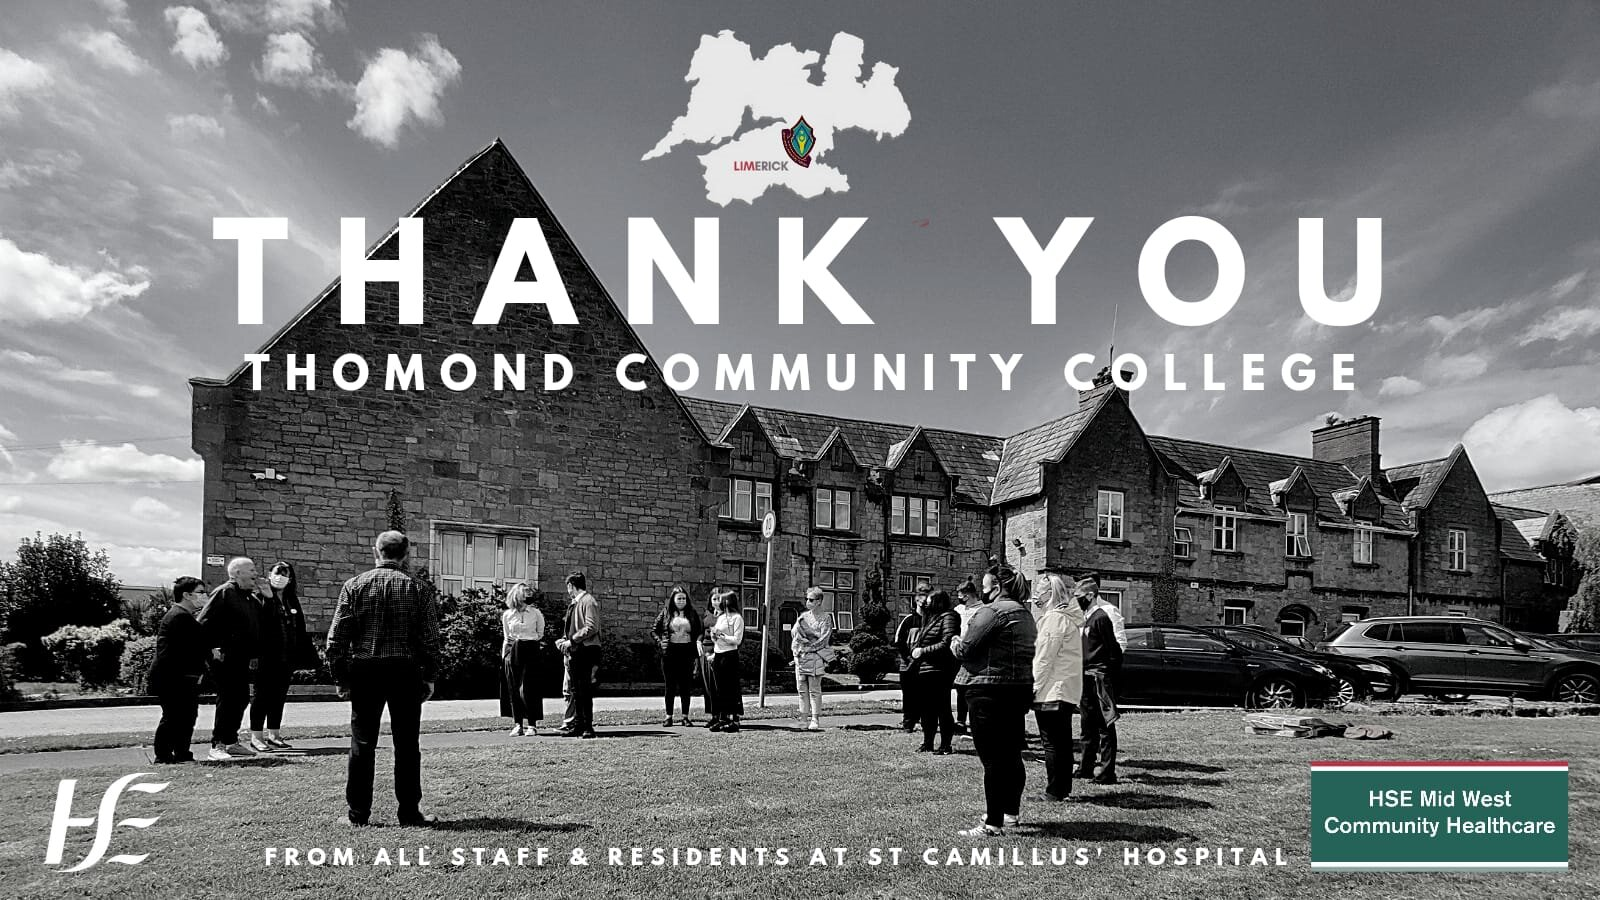 St Camillus Community Hospital thank Thomond Community College for their generosity and innovation.